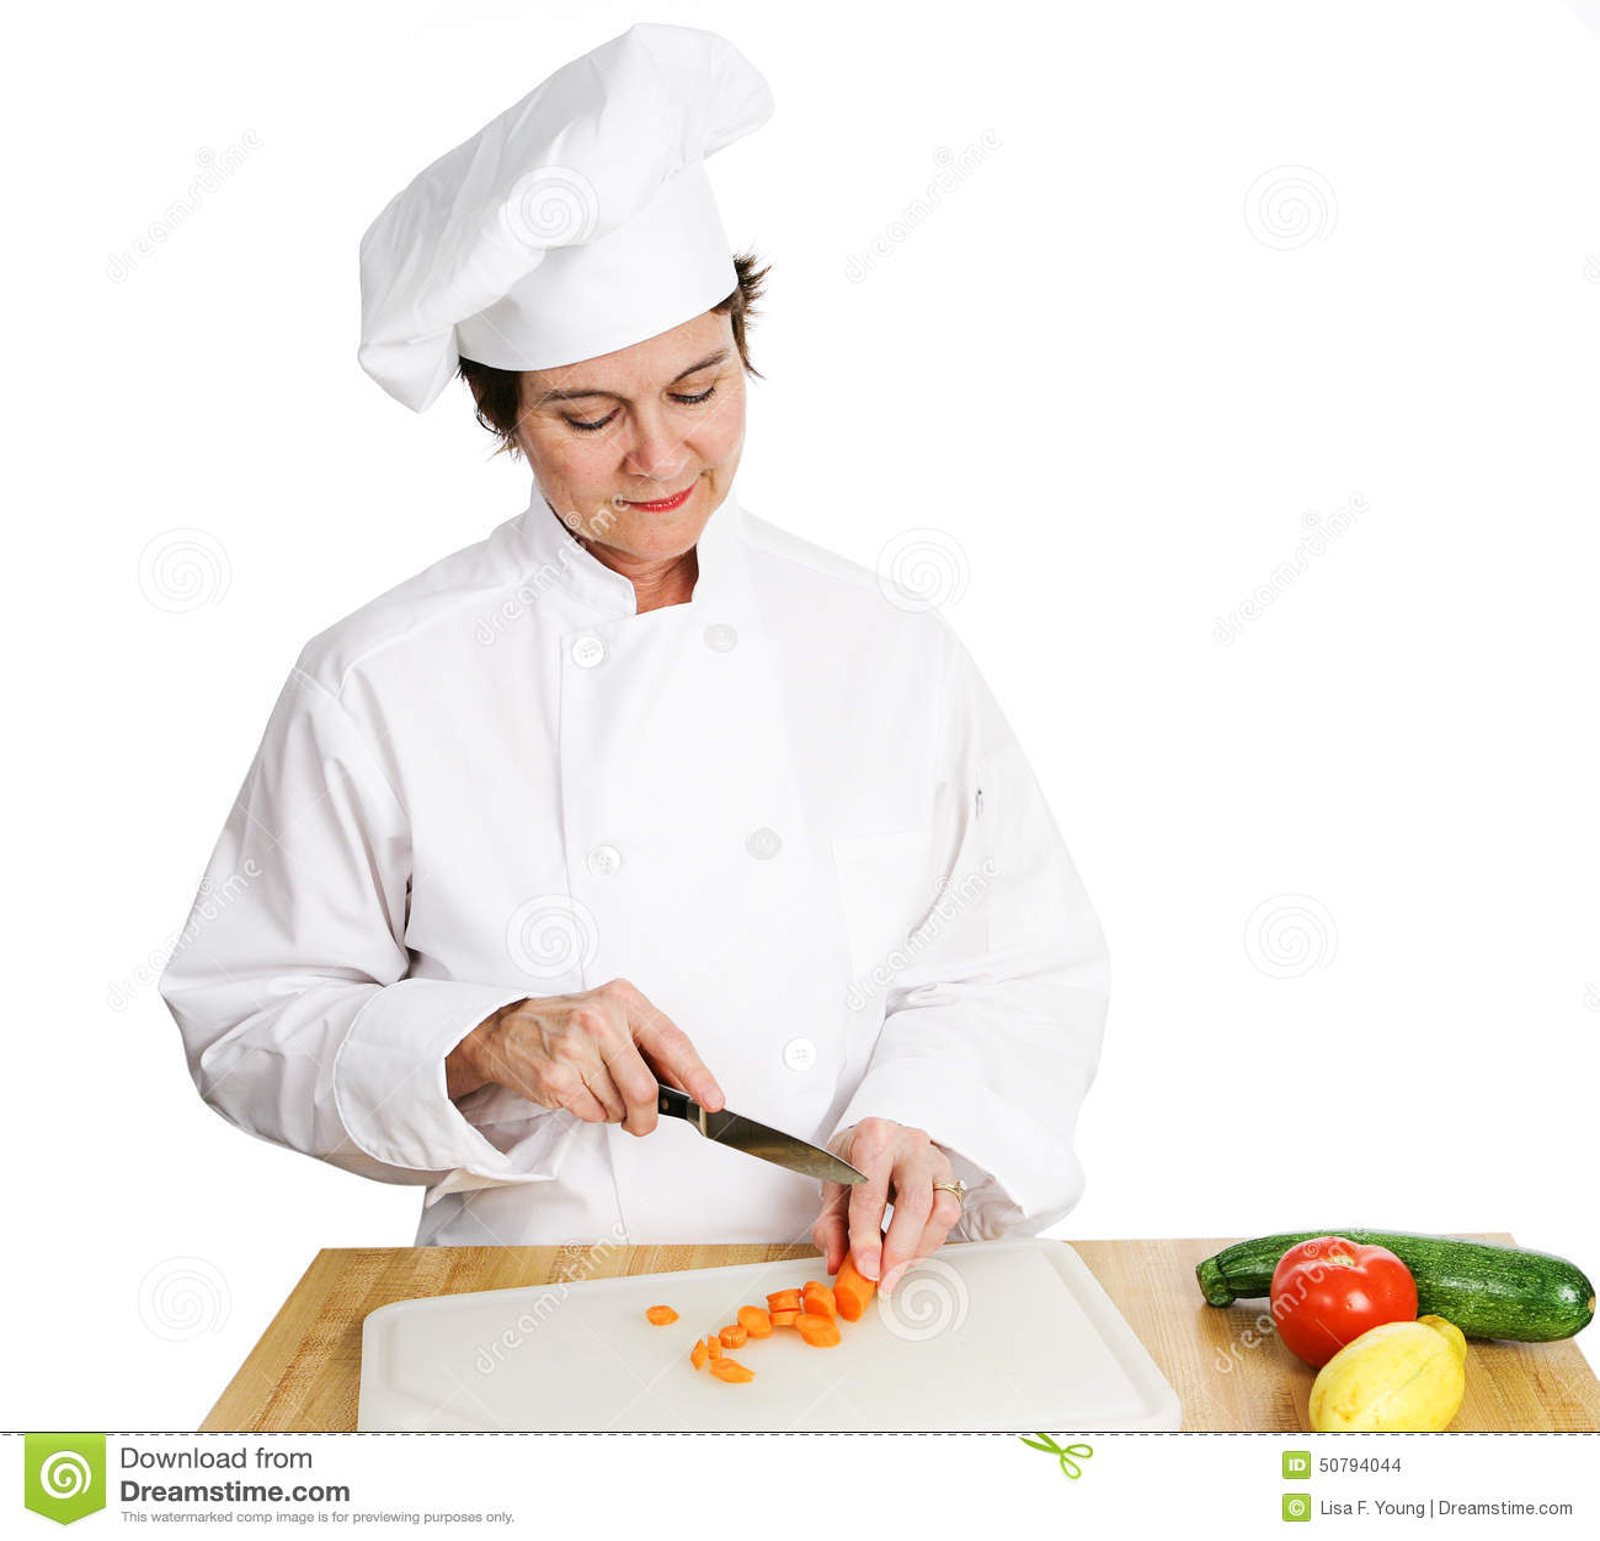 Chef Preparing Vegetables Stock Photo - Image: 50794044